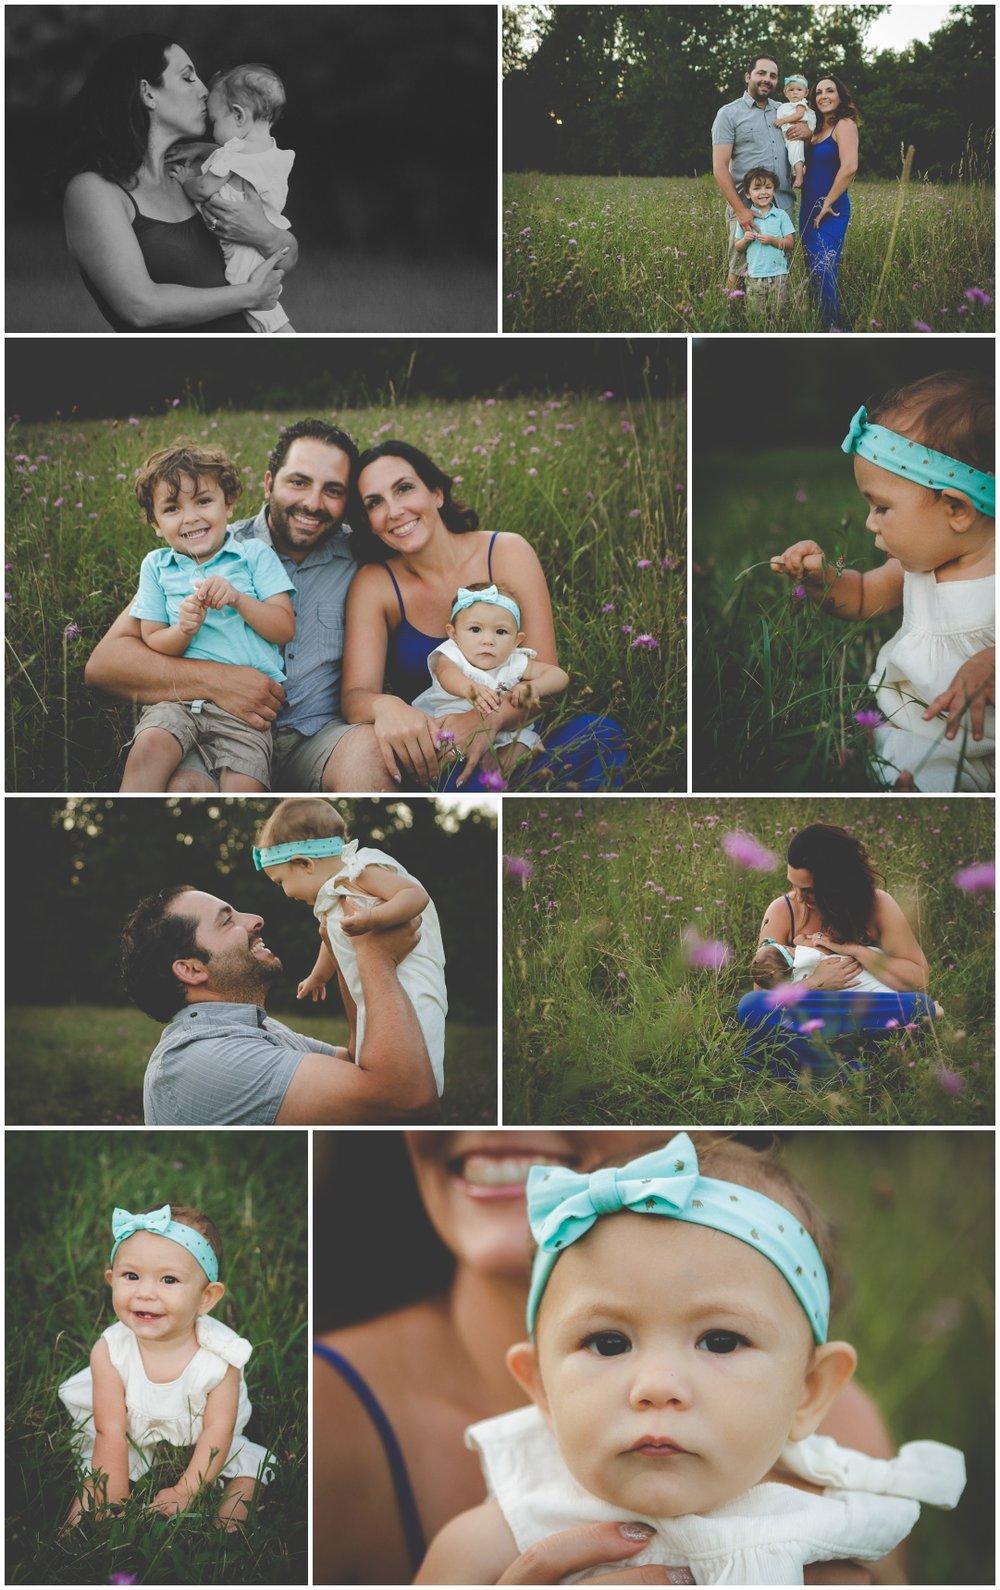 buffalonyfamilyphotographer.jpg